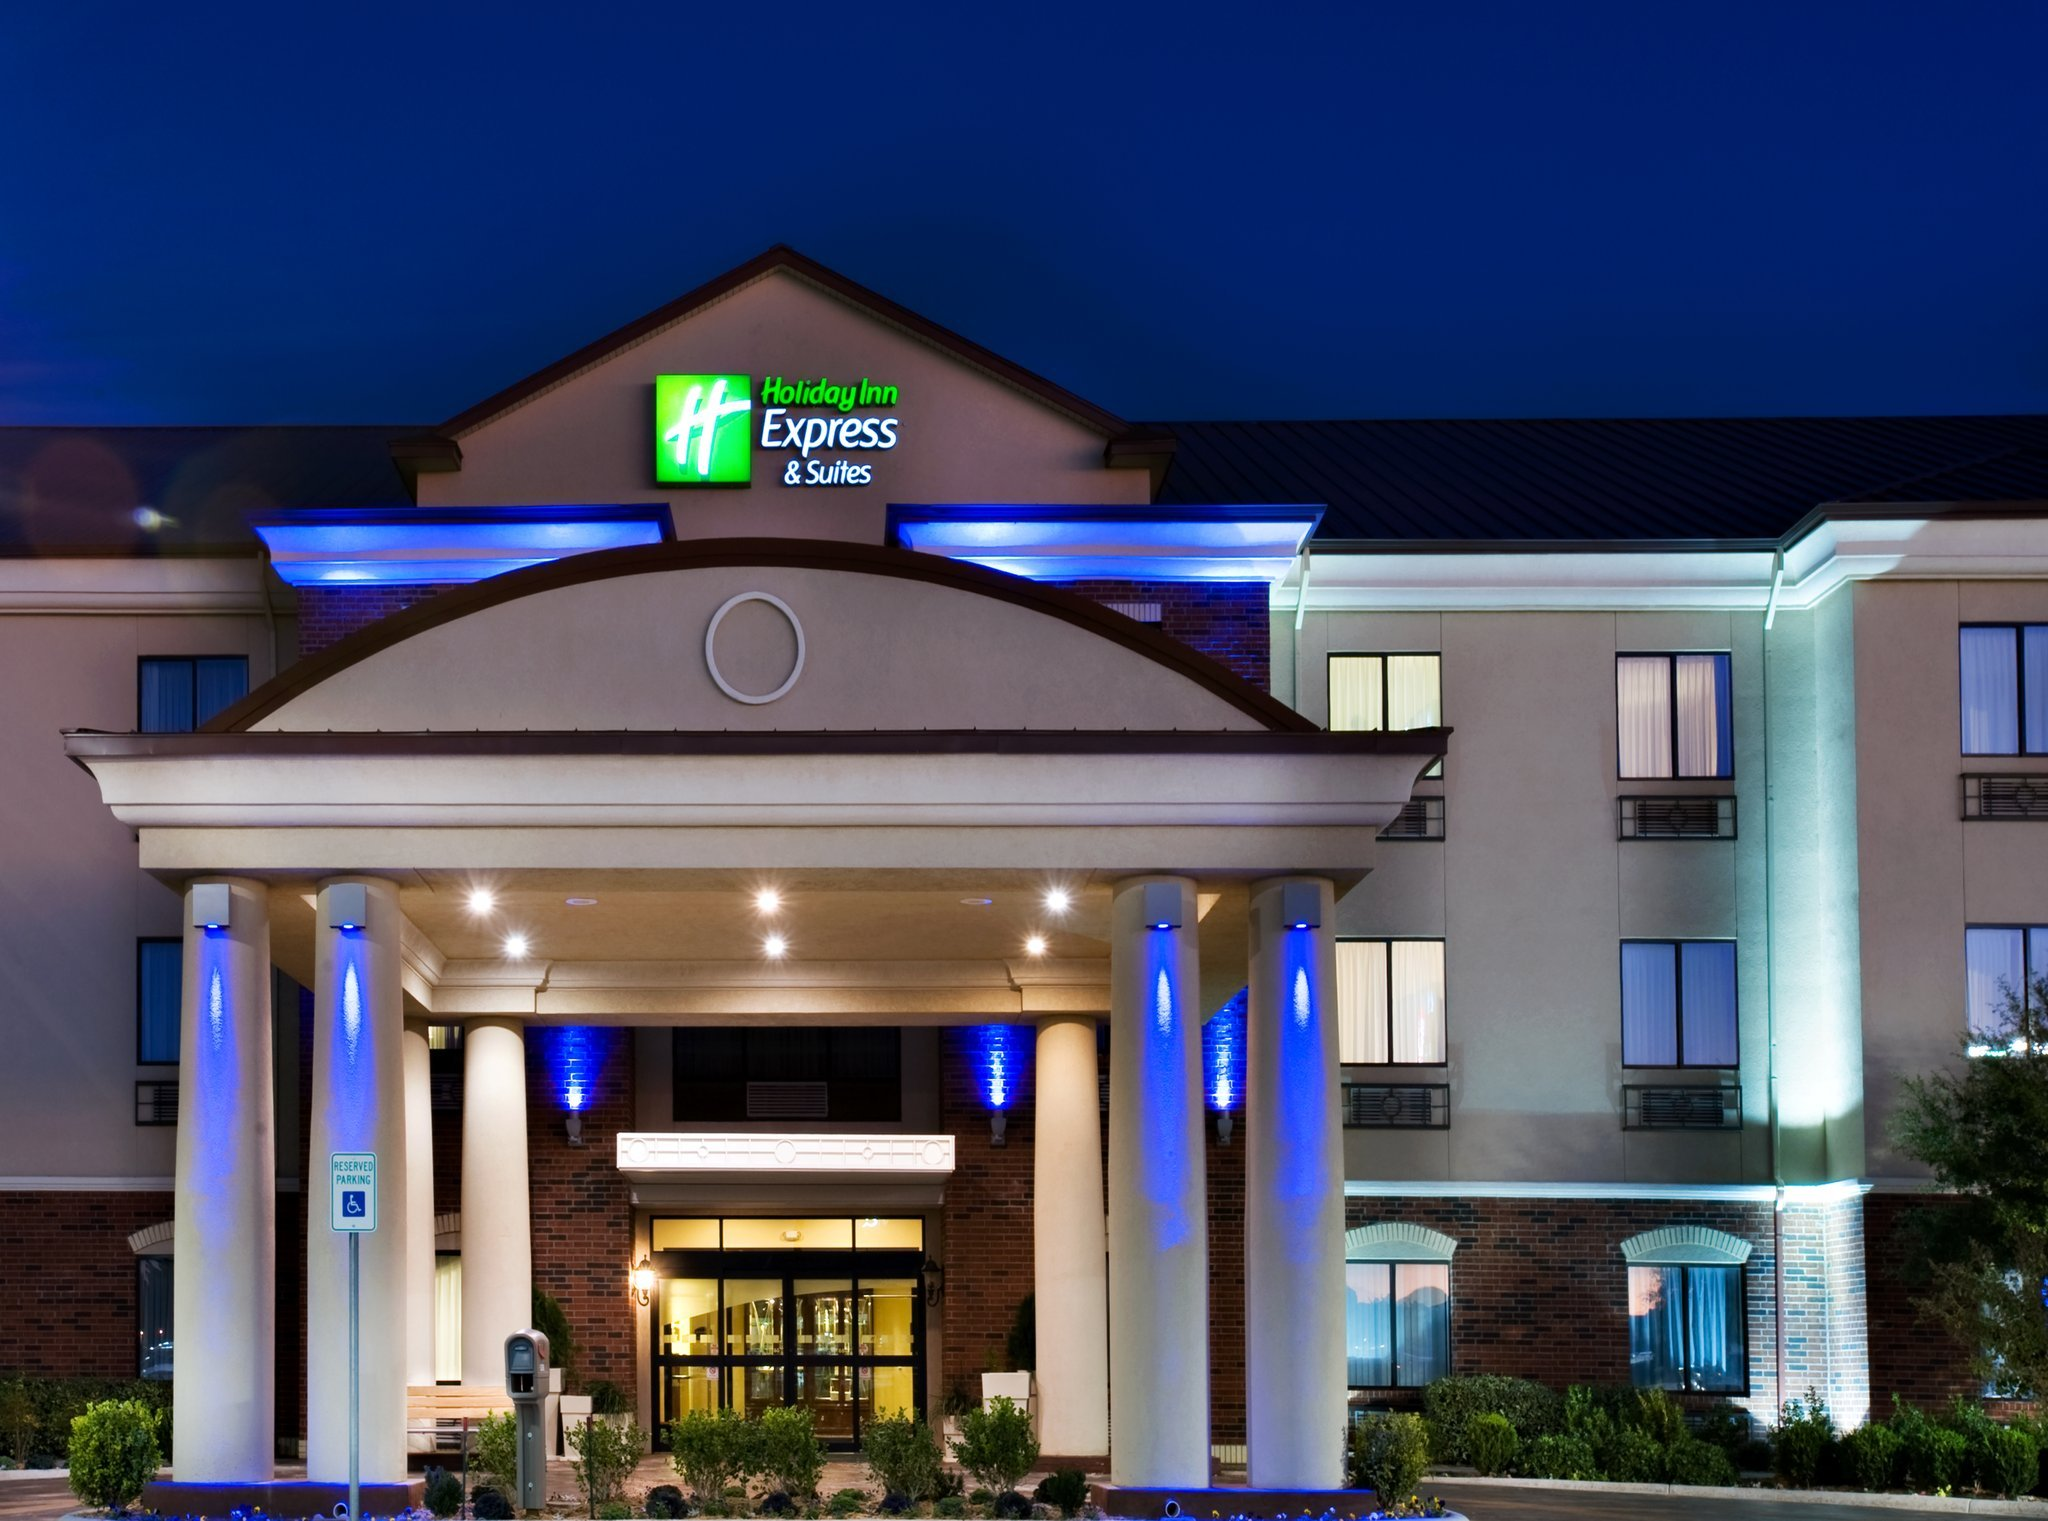 Holiday Inn Express Midland Loop 250